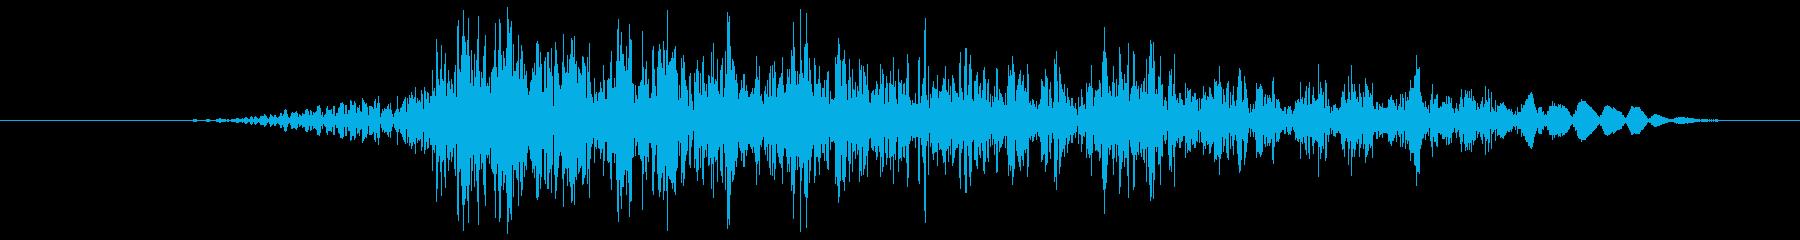 ANIMAL VOCAL Voca...の再生済みの波形